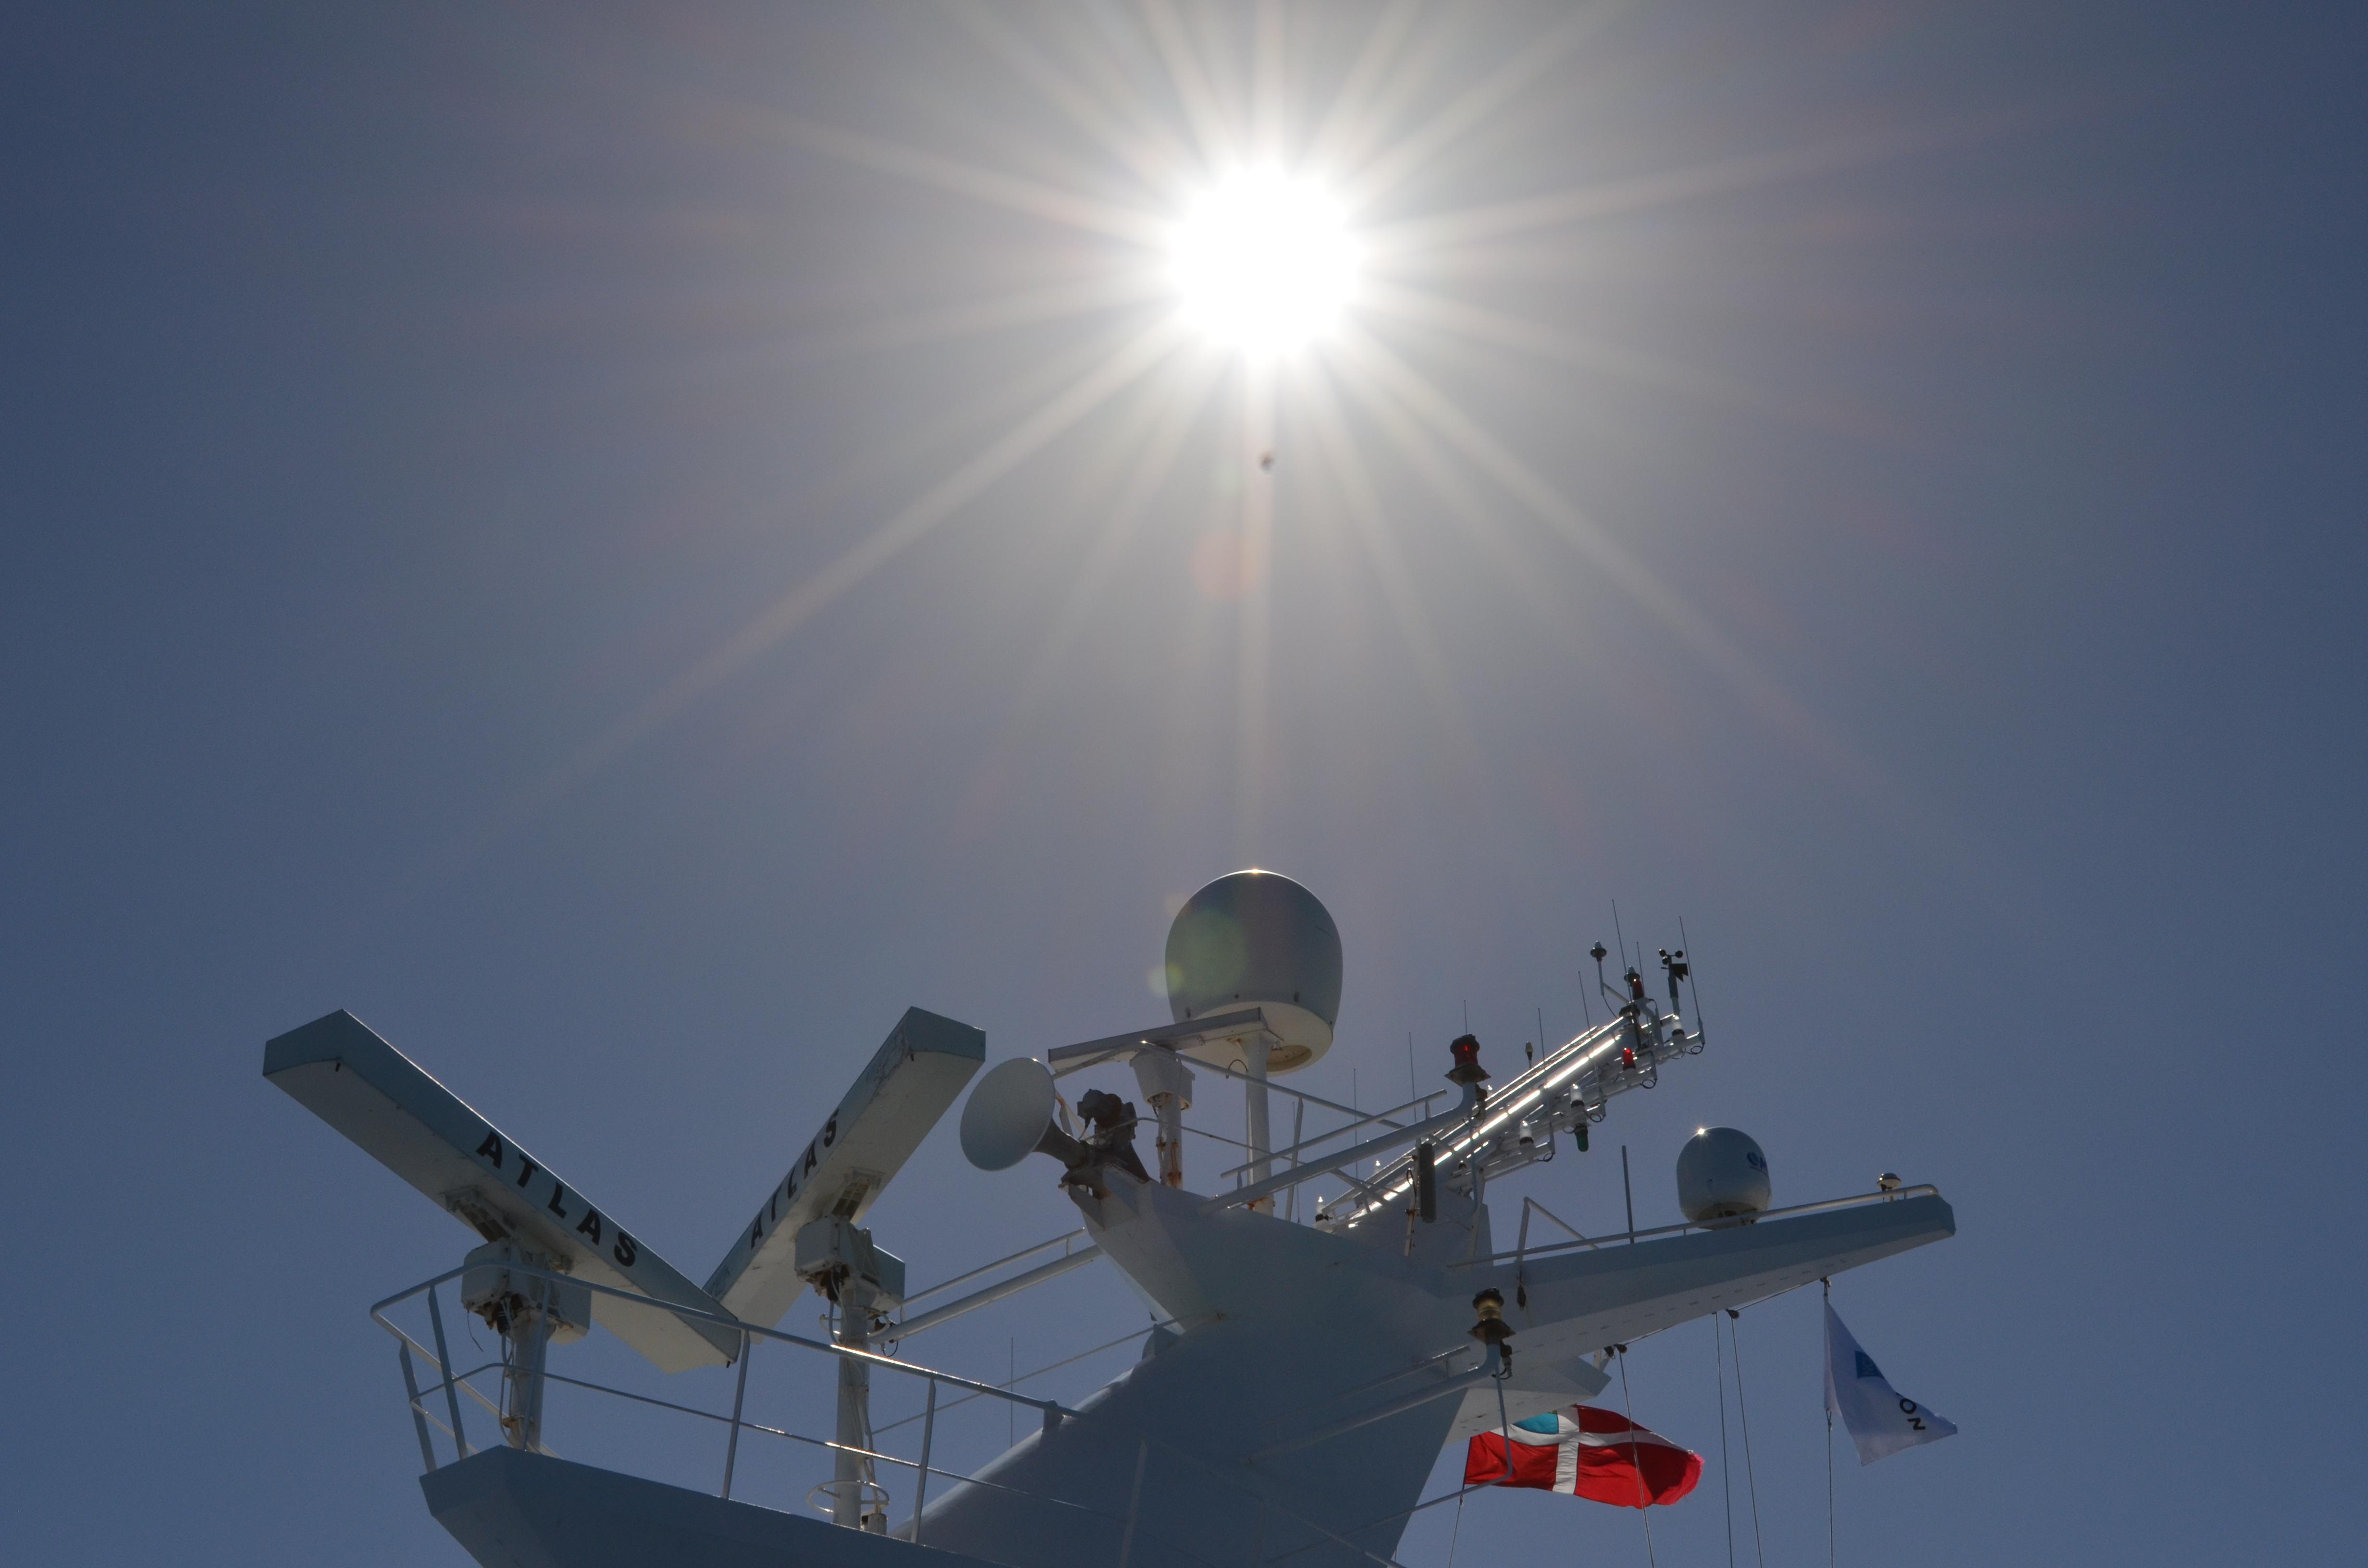 Ship antenna, Antenna, Boat, Rays, Ship, HQ Photo